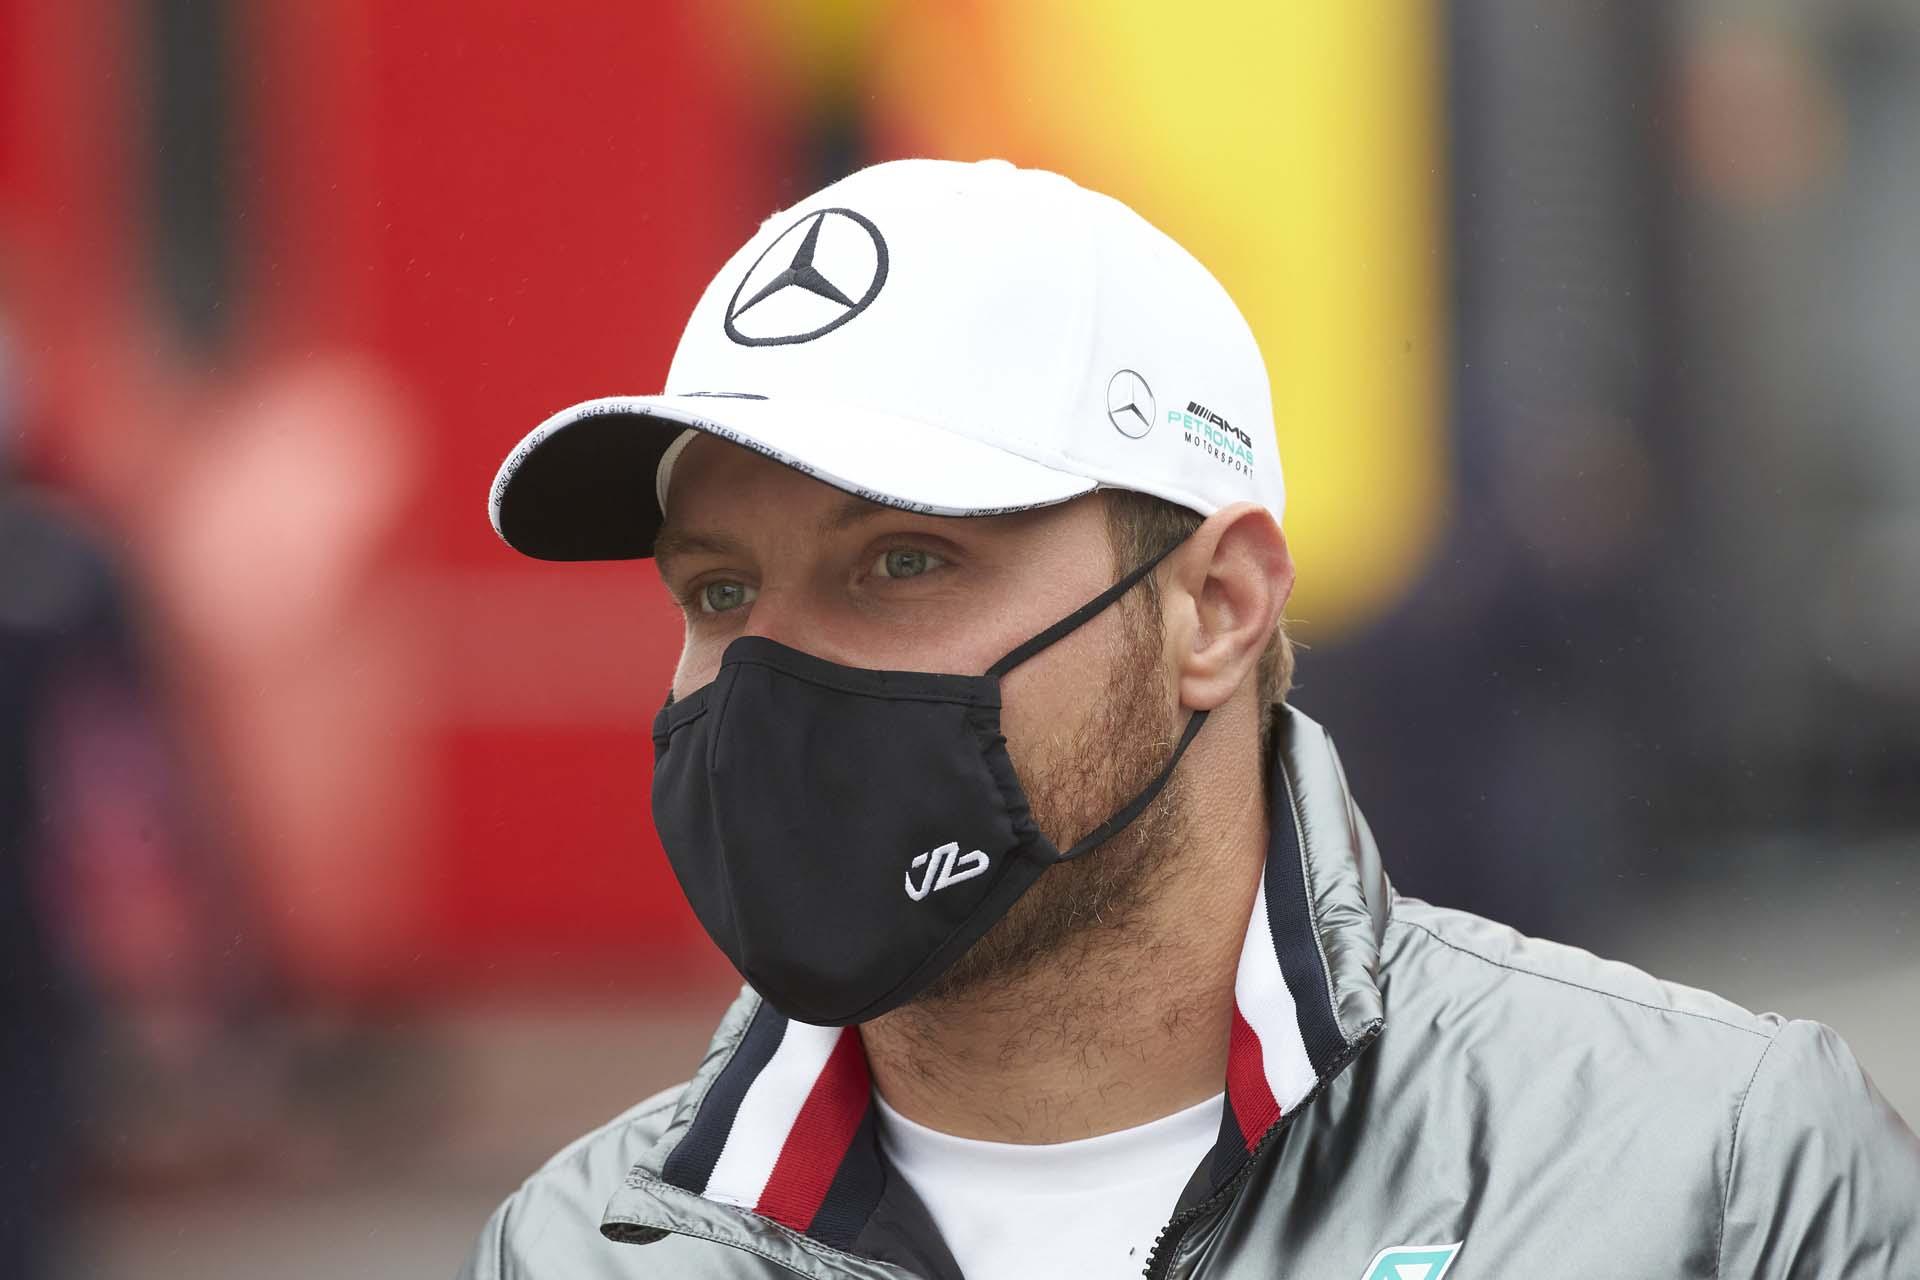 2020 Eifel Grand Prix, Thursday - Steve Etherington